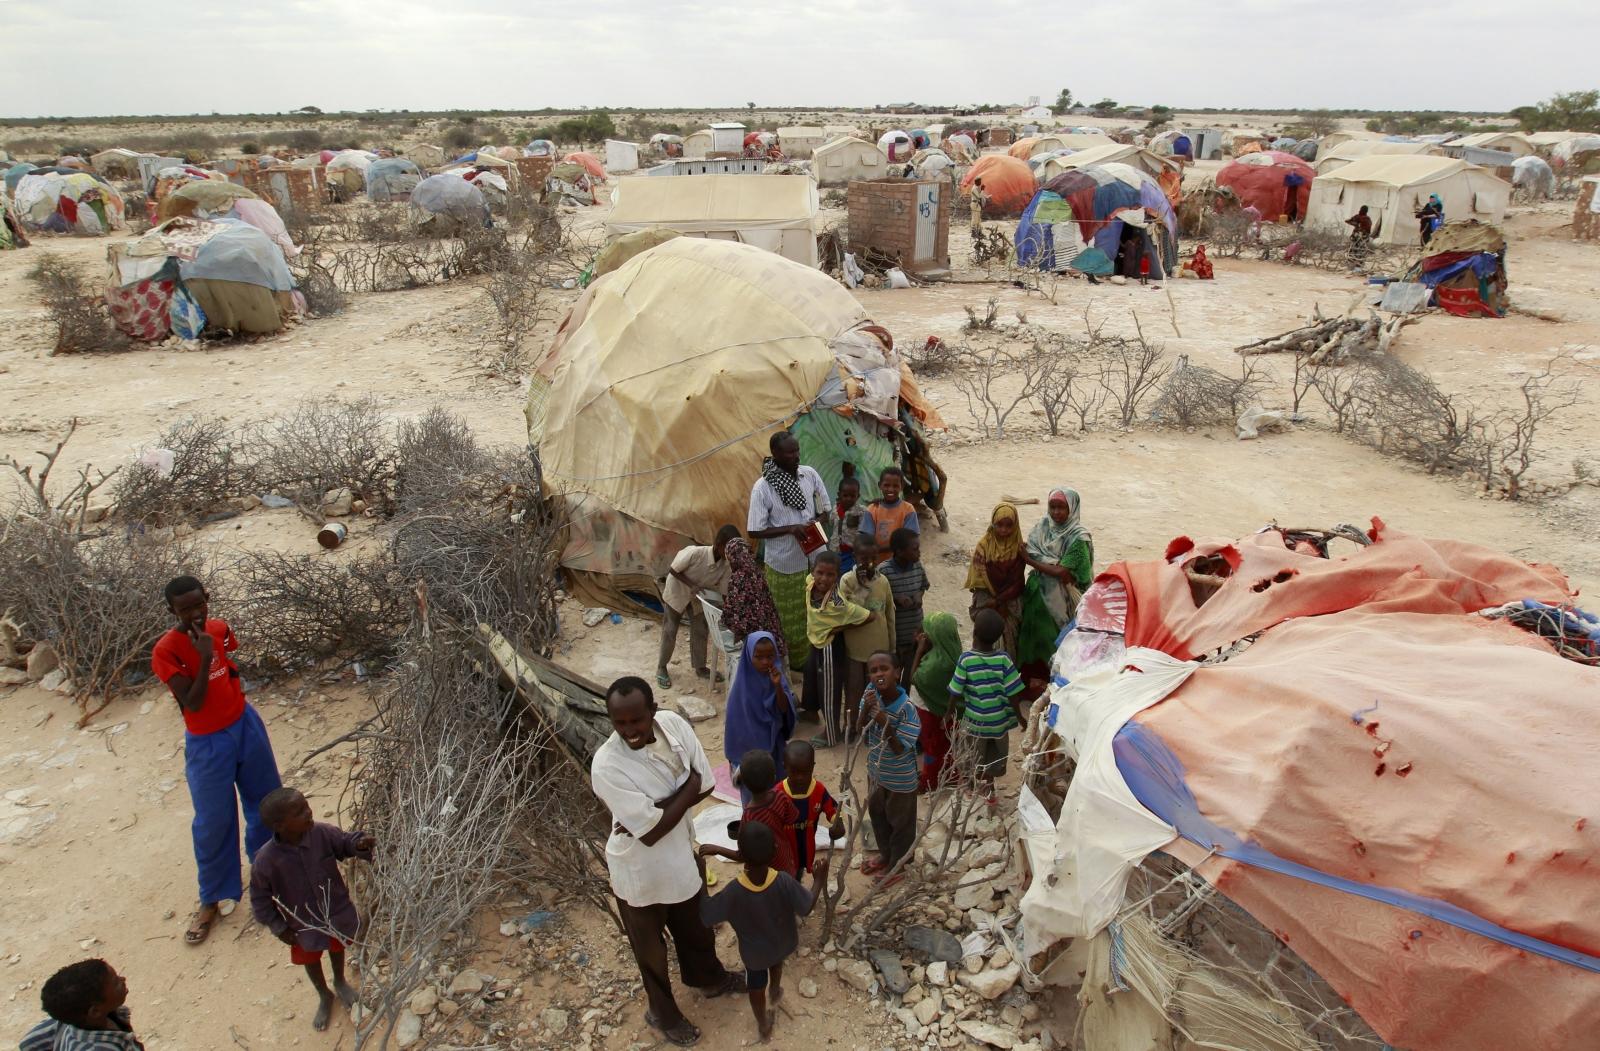 Somalia clashes